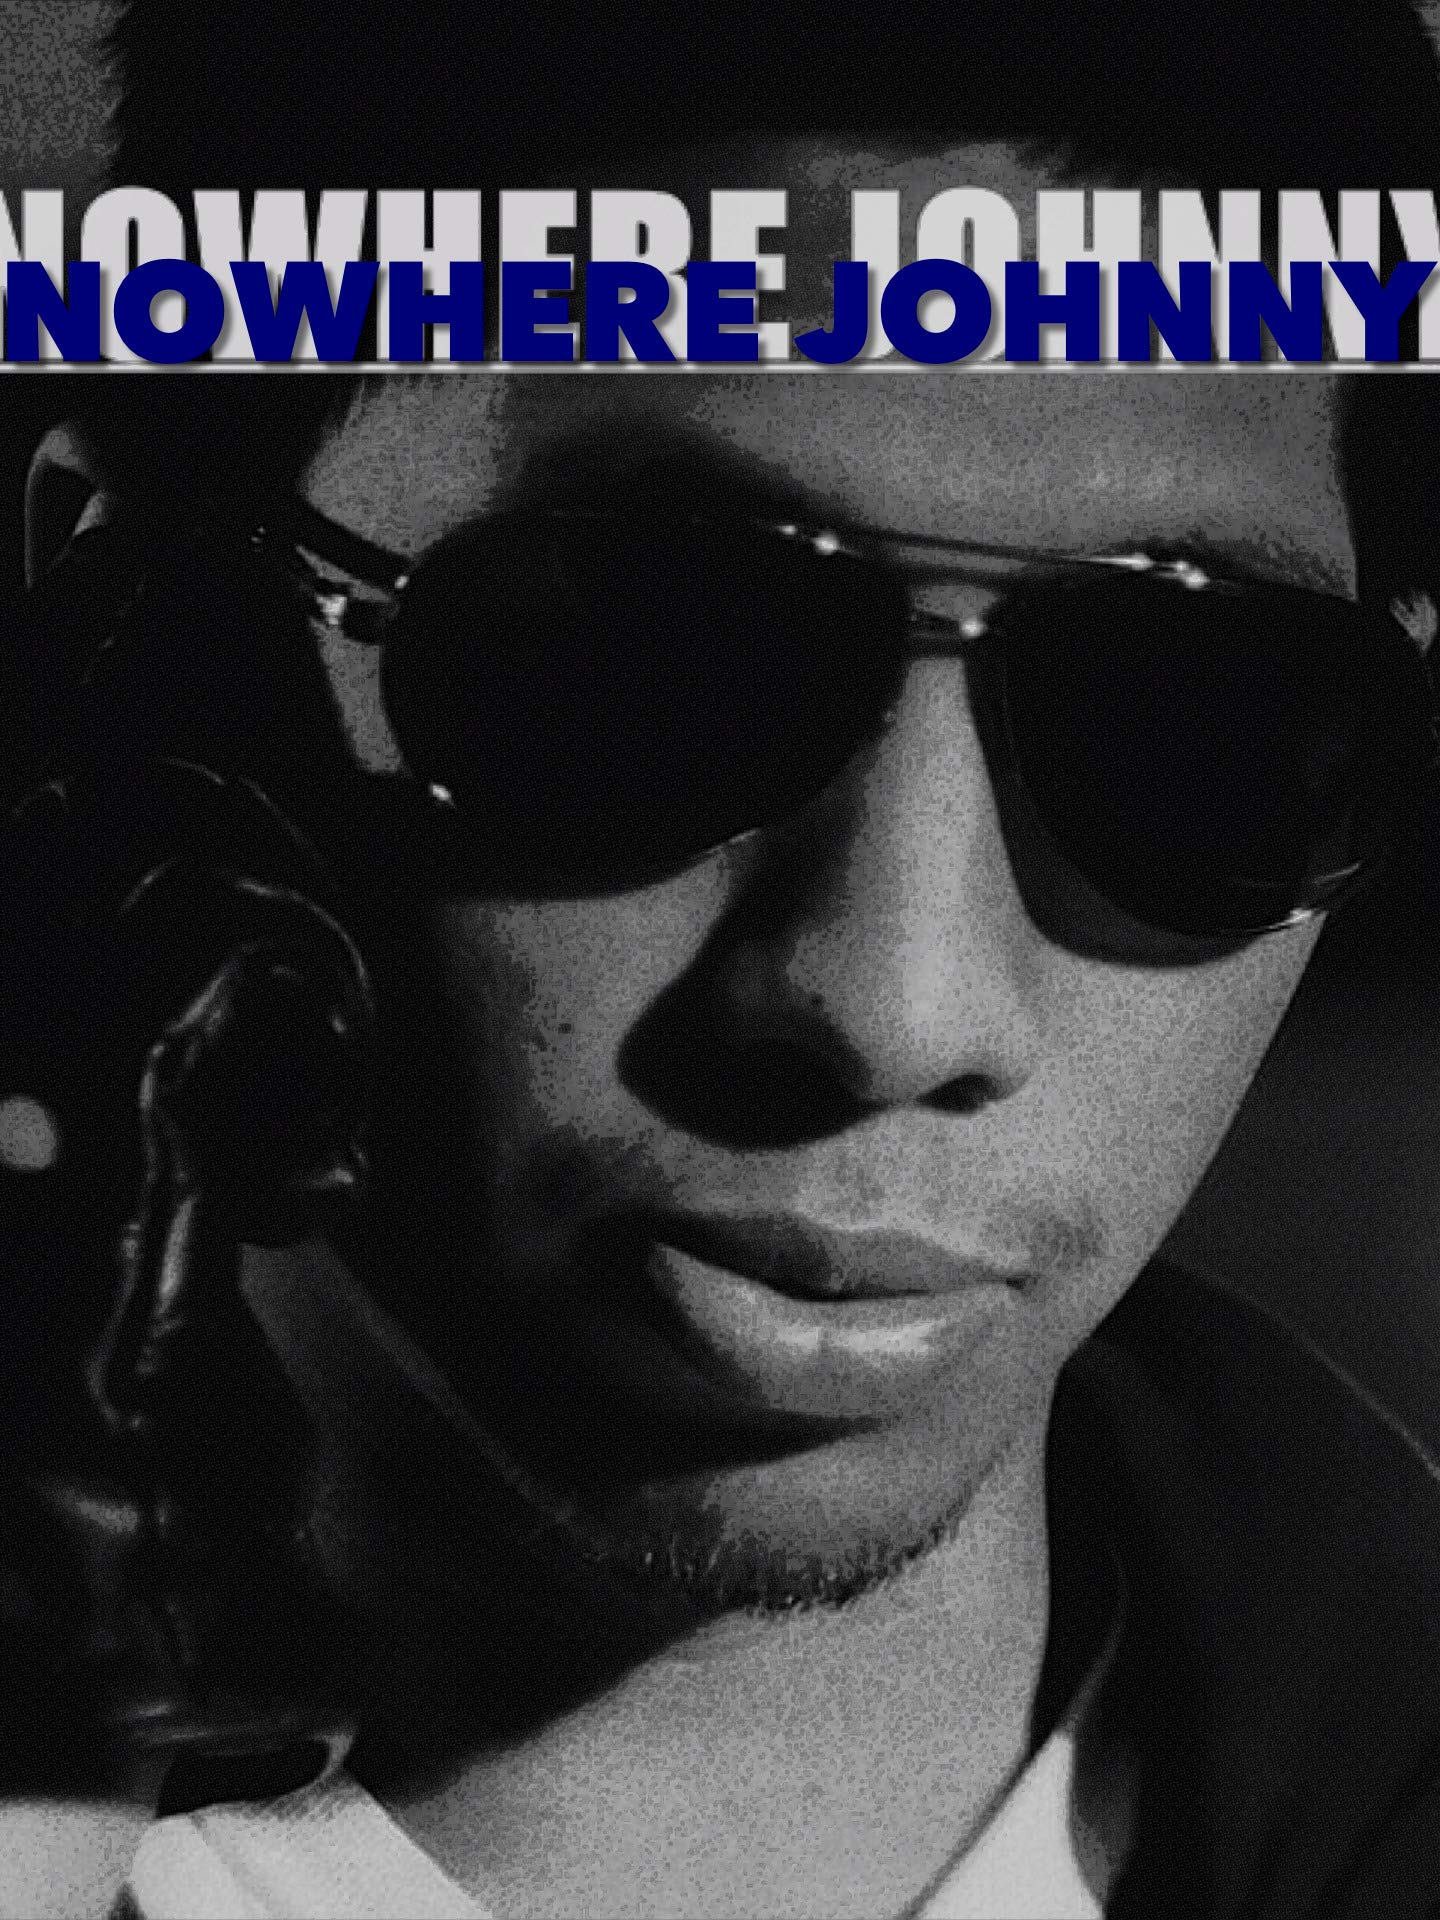 Nowhere Johnny